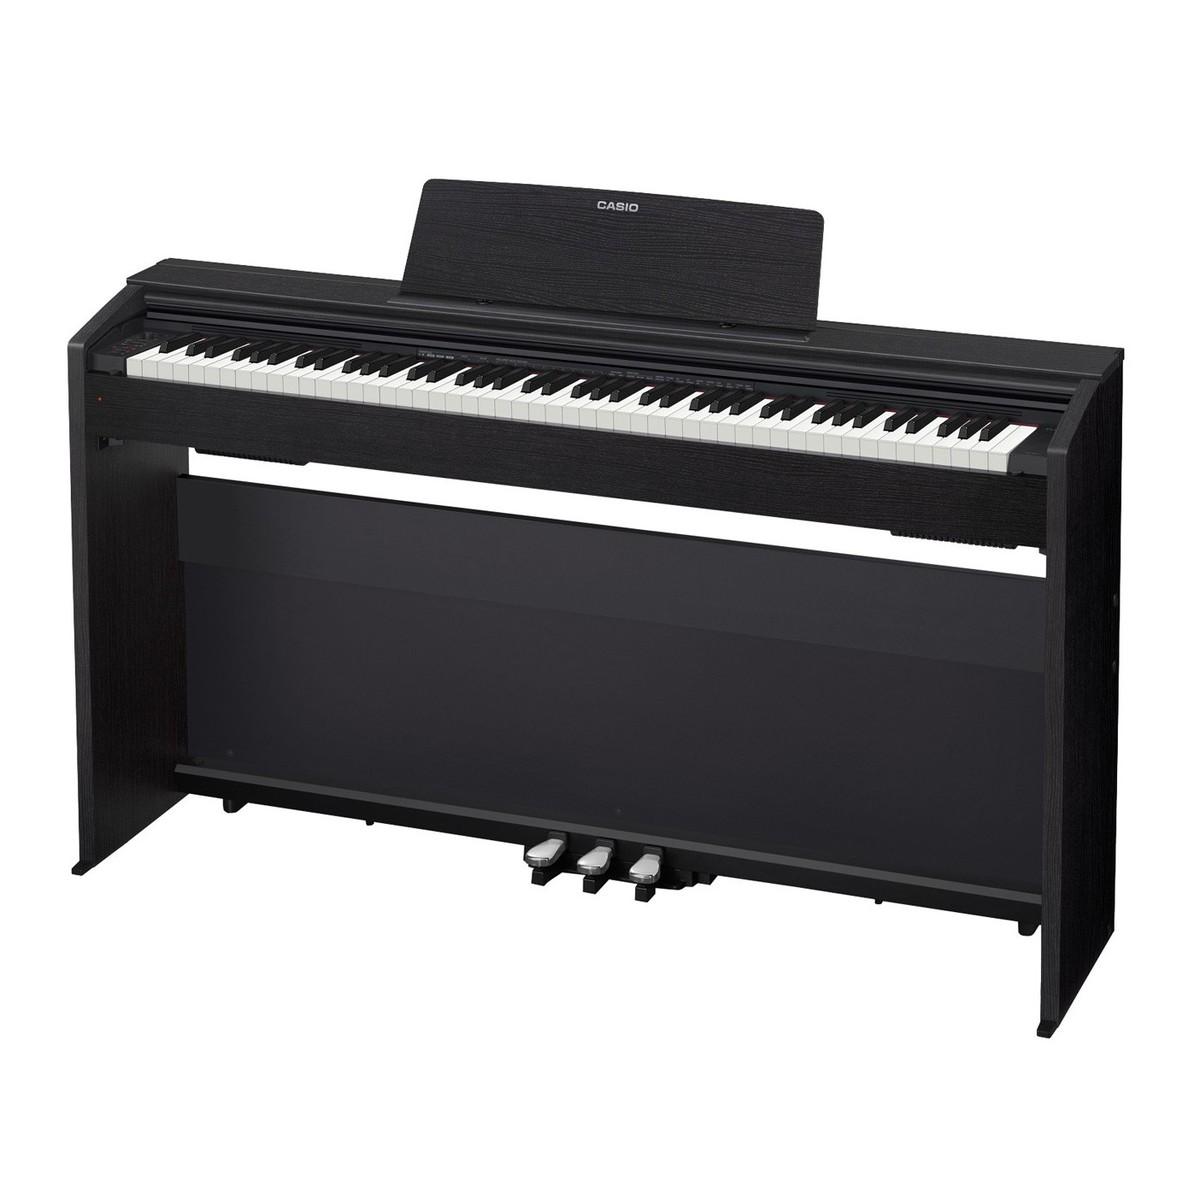 casio privia px 870 digital piano black b stock at gear4music. Black Bedroom Furniture Sets. Home Design Ideas